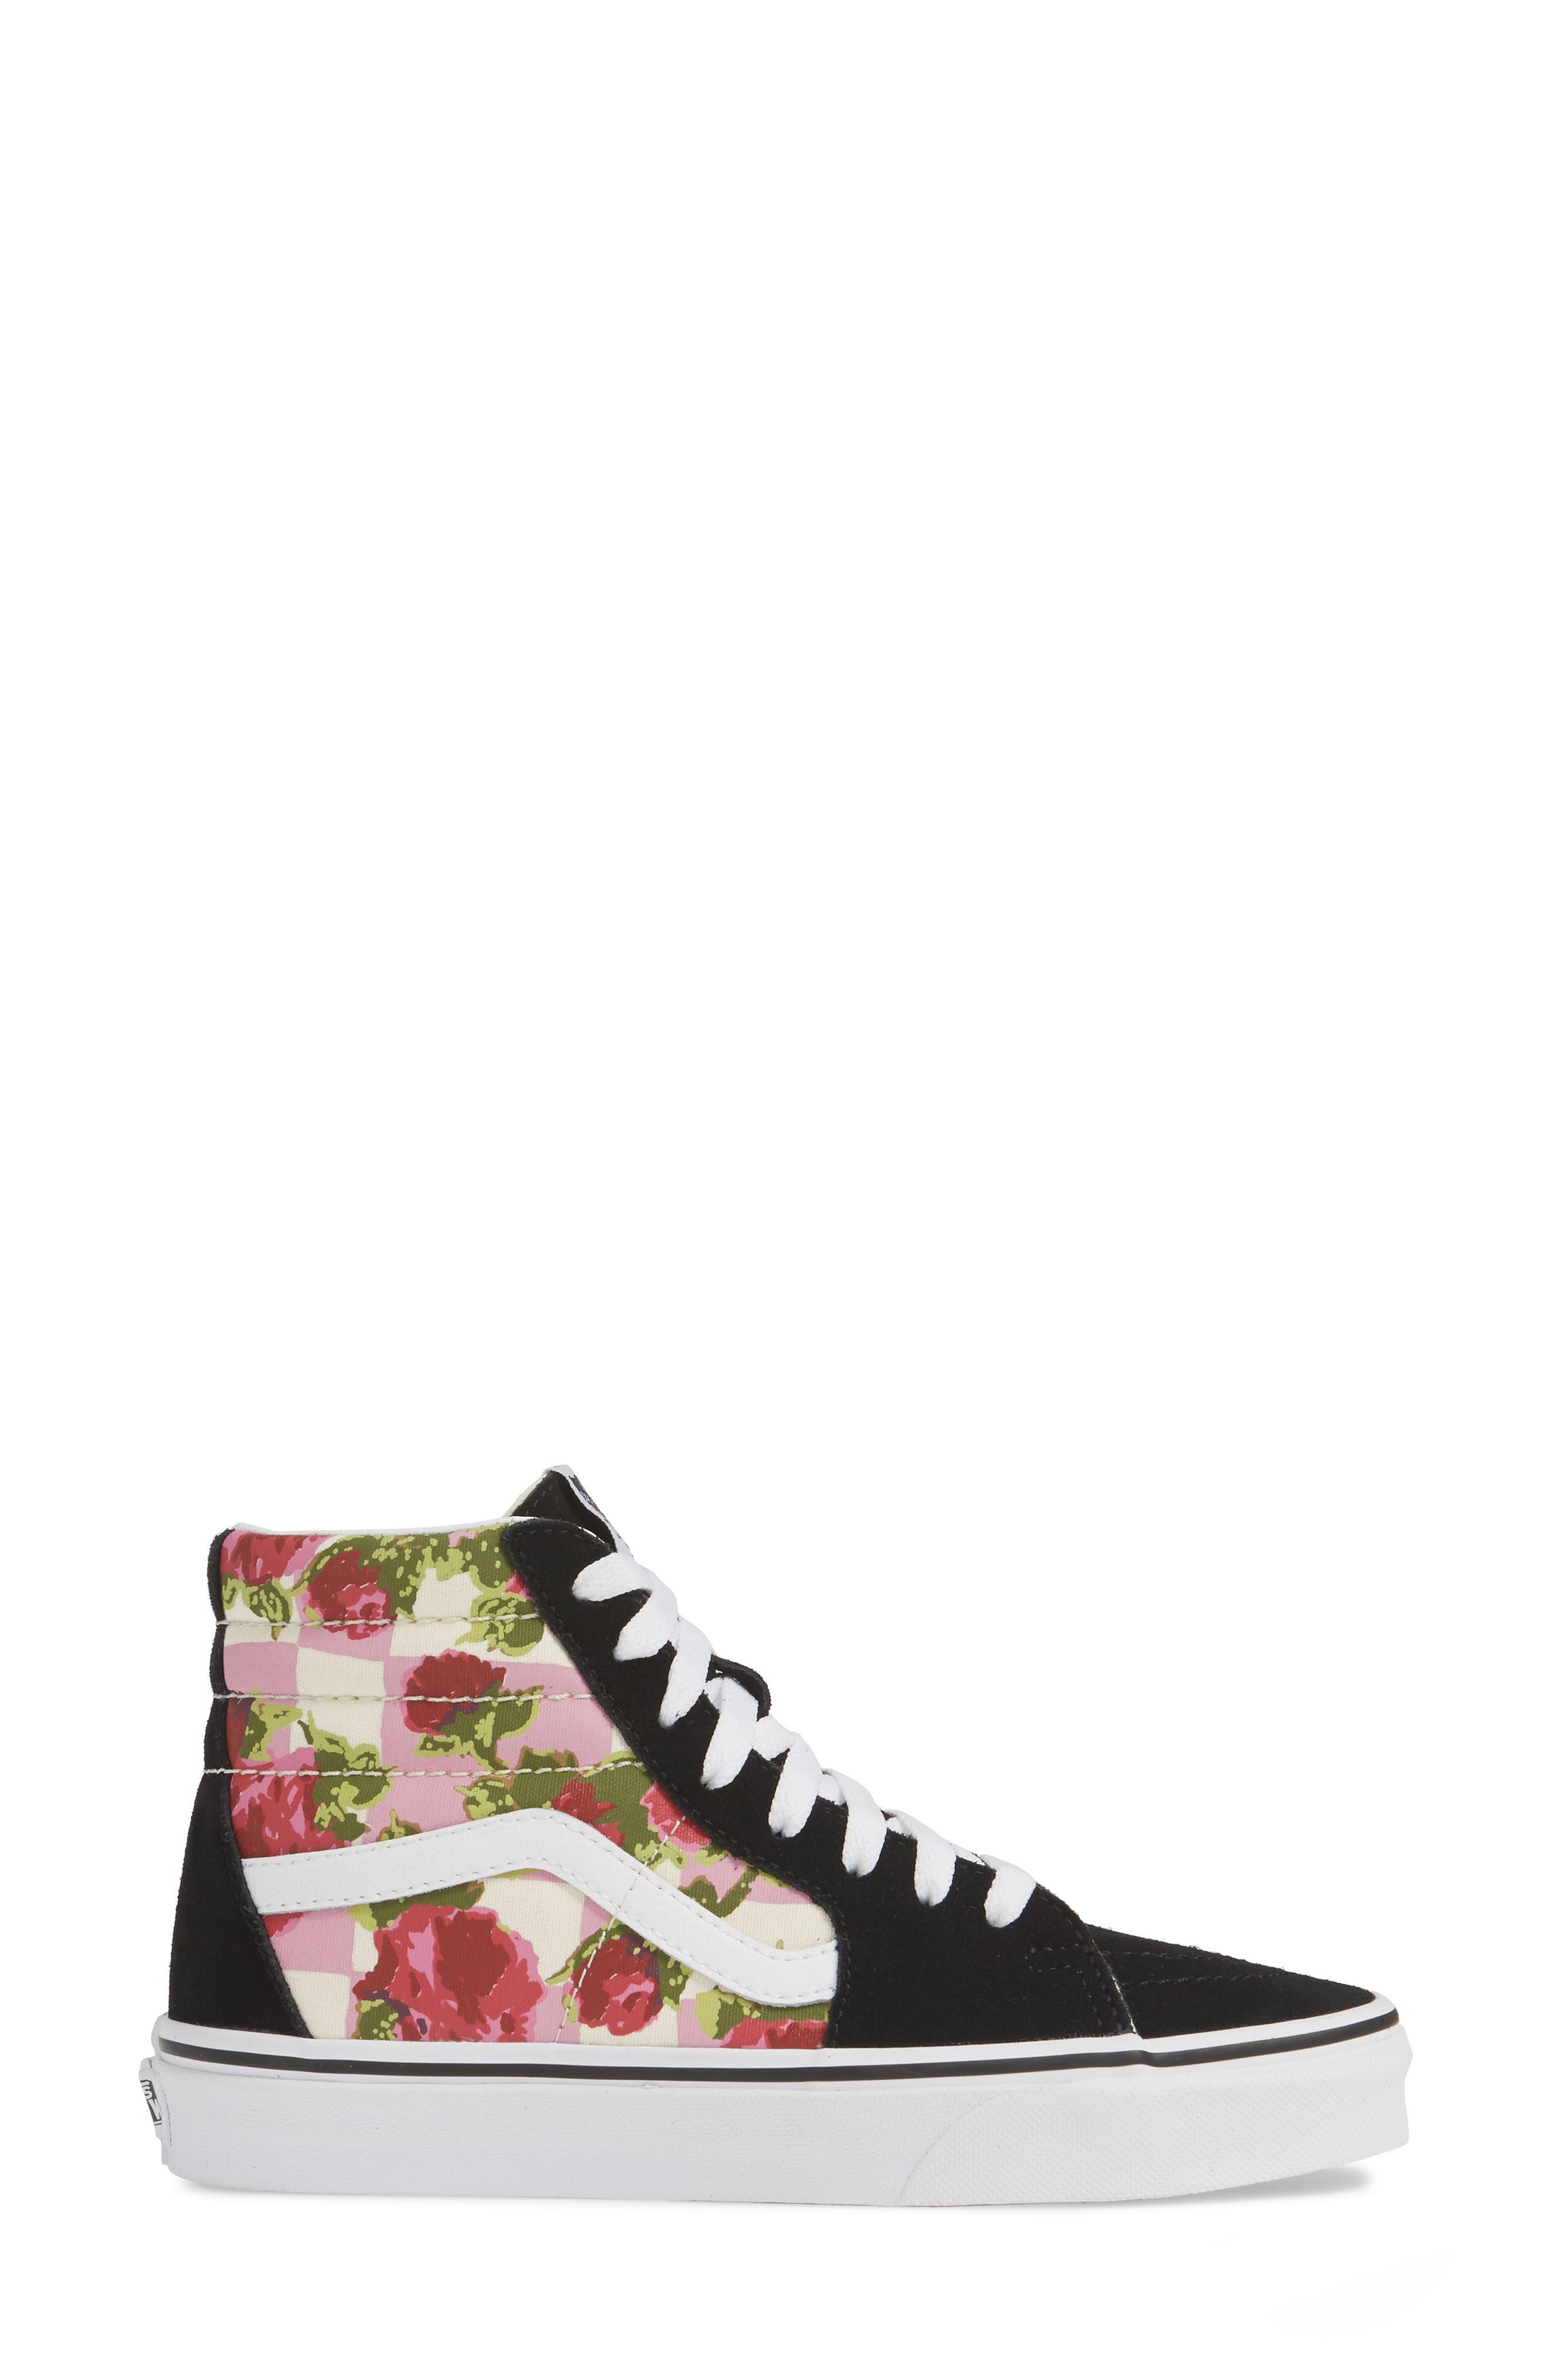 VANS, Sk8-Hi Floral Sneaker, Alternate thumbnail 3, color, FLORAL MULTI/ TRUE WHITE